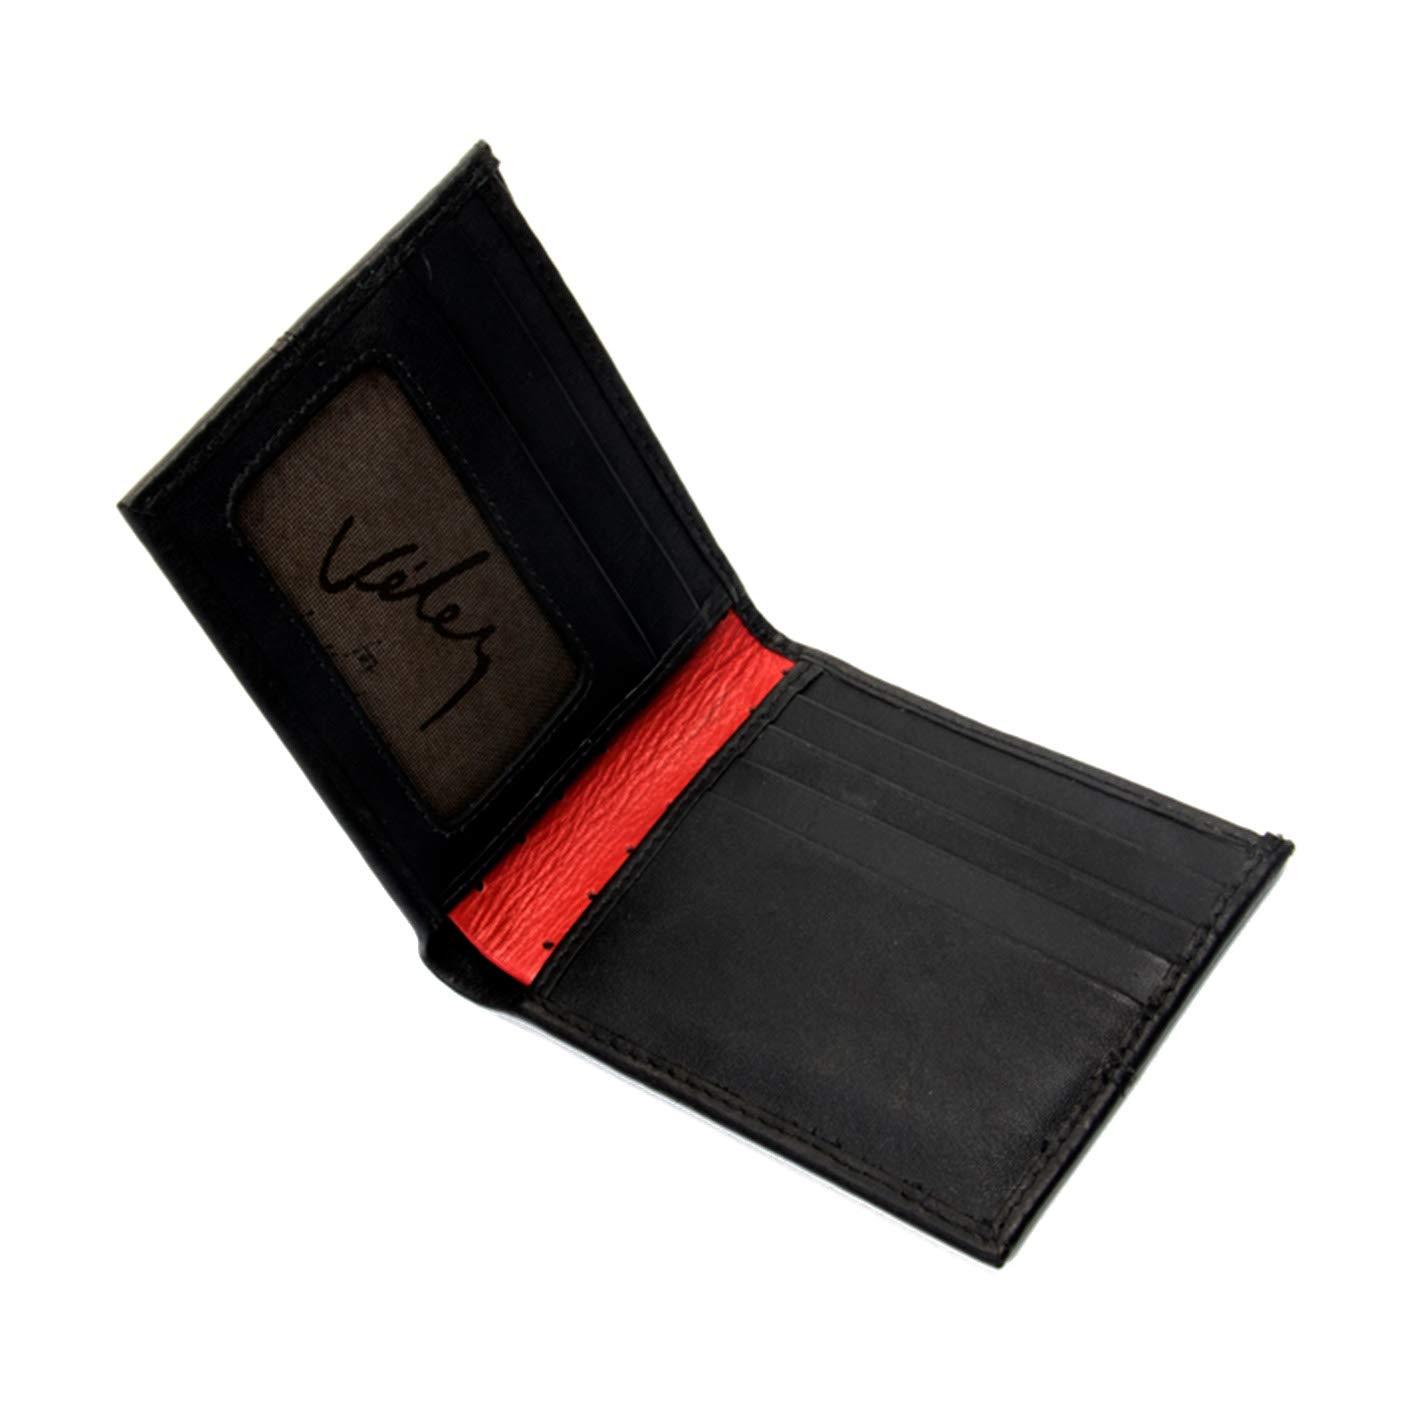 8bf7b55bd7b2 Velez Genuine Men Leather Soft Thin Slimfold Bifold Holder Cartera de Cuero  para Hombre Caballero Black at Amazon Men's Clothing store: